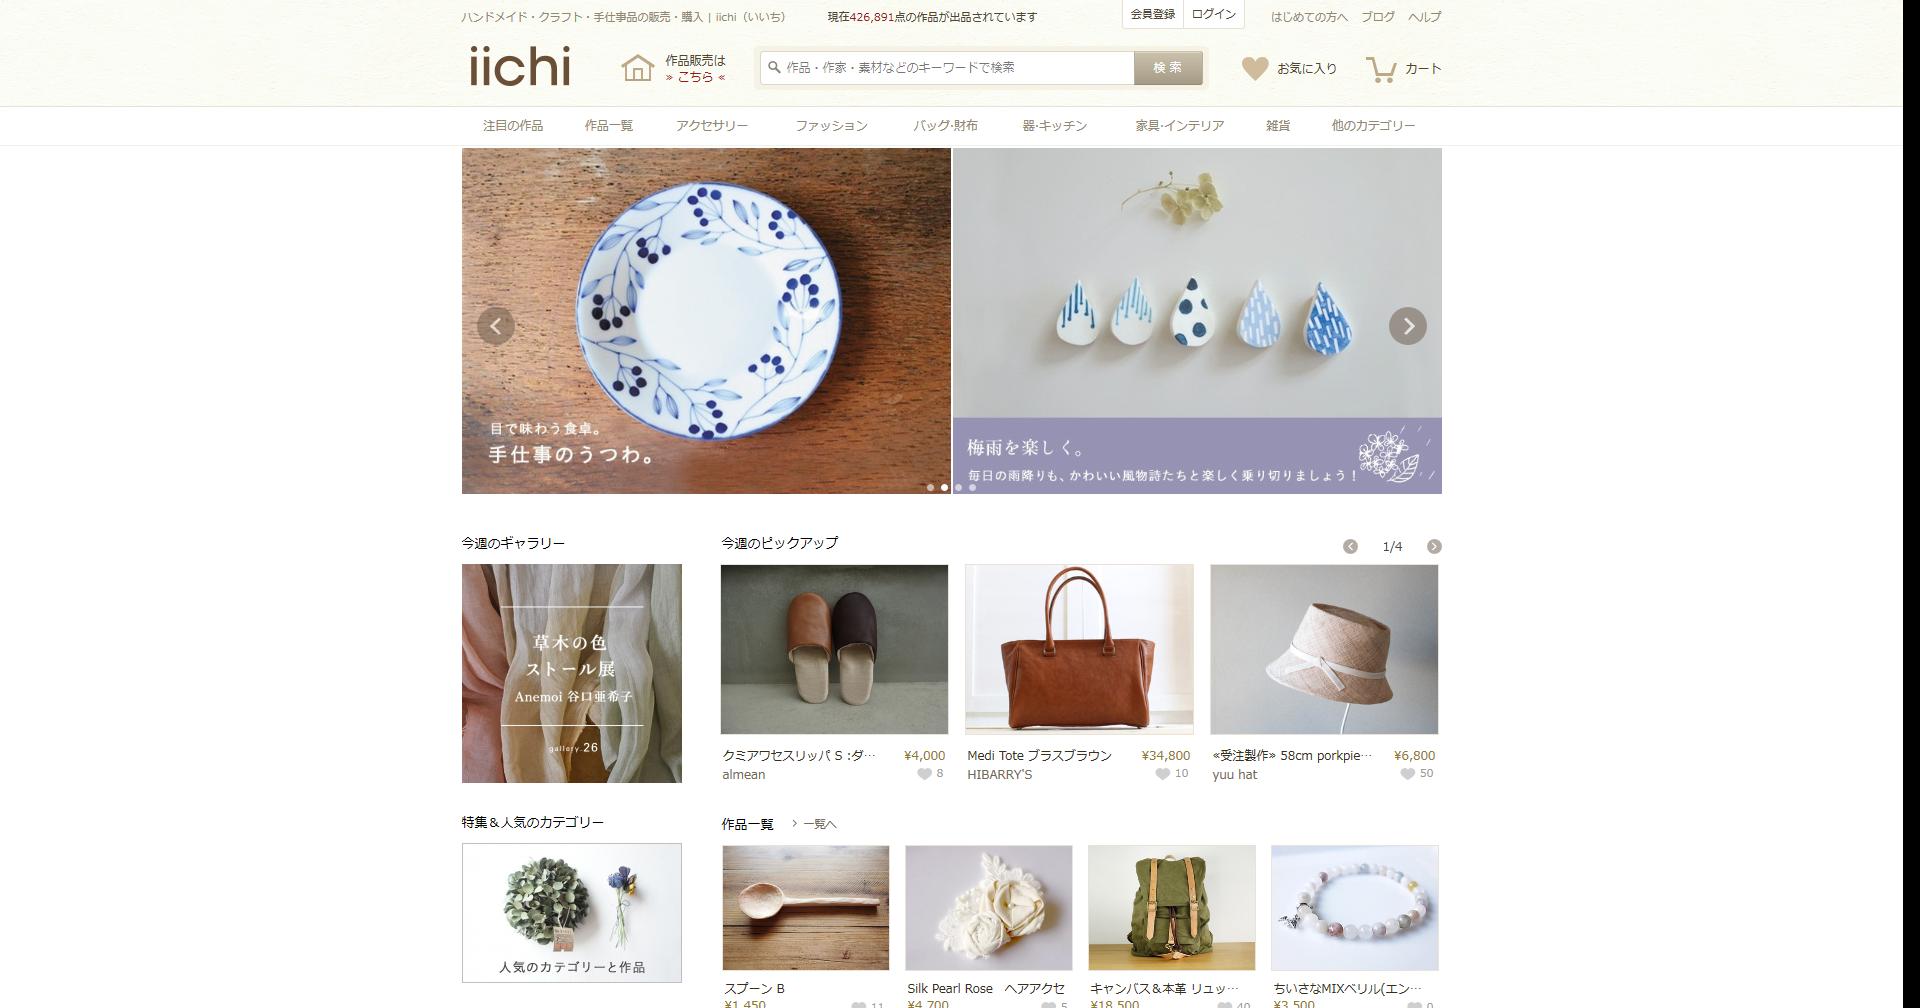 iichi(いいち) ハンドメイド・クラフト・手仕事品の通販